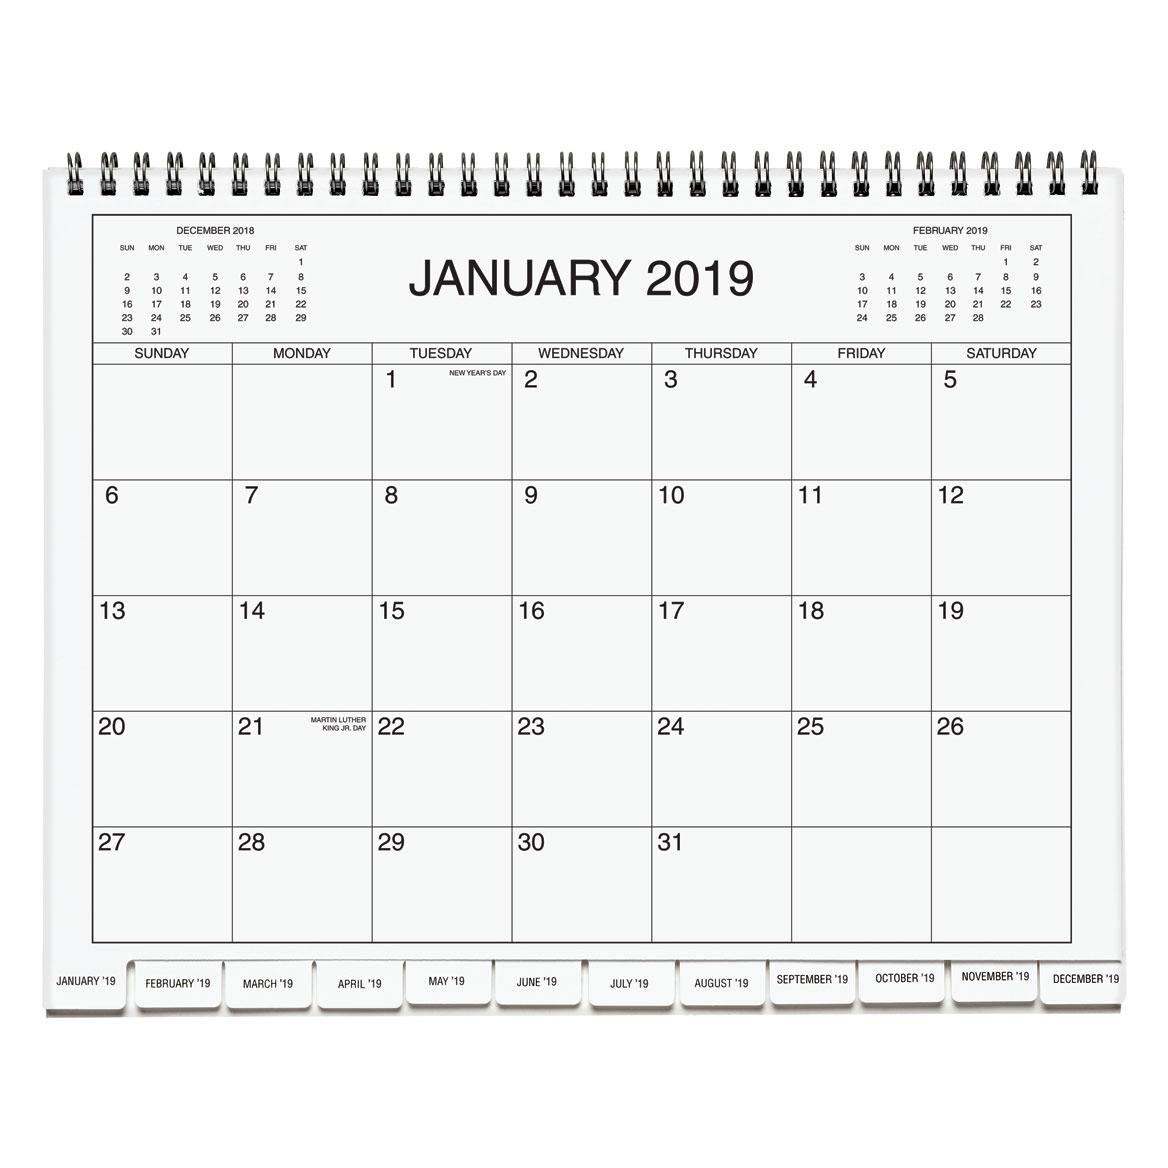 3 Year Calendar Diary 2019-2021 - Calendar Organizers ...